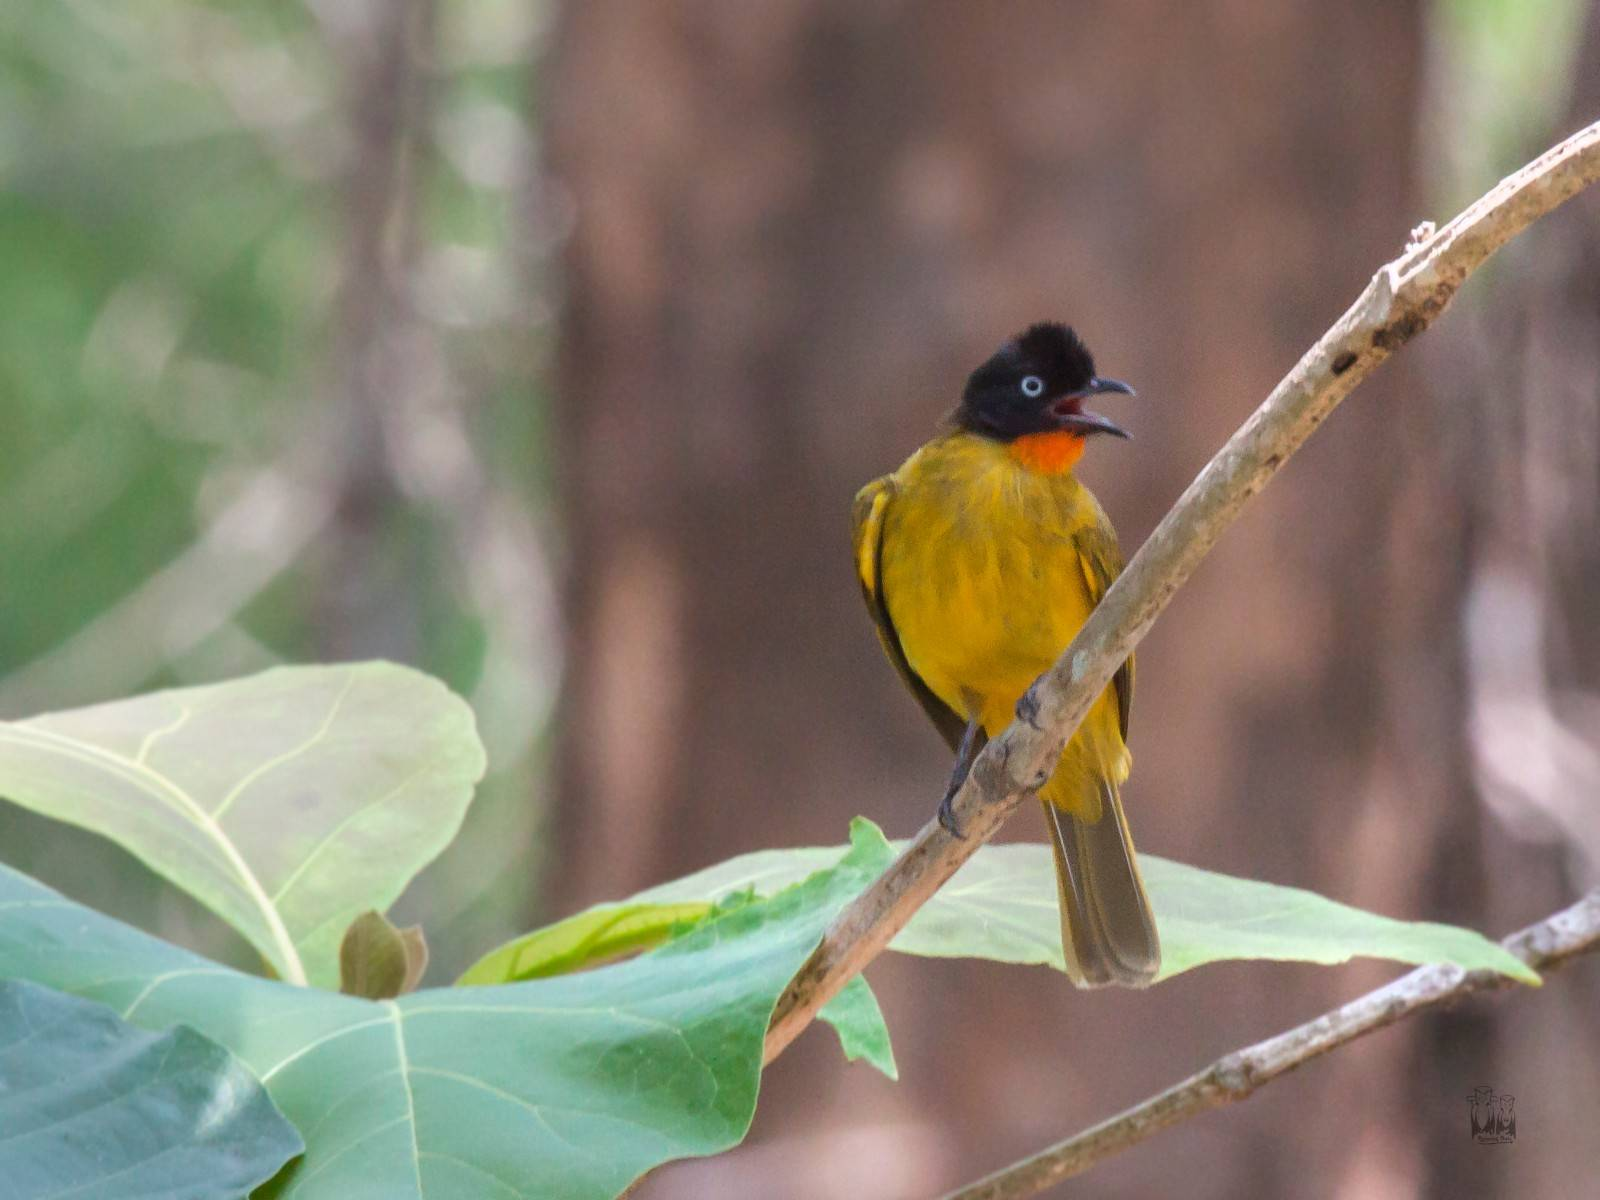 Flame throated bulbul,karimala trek,parambikulam tiger reserve, Pycnonotus gularis,western ghats